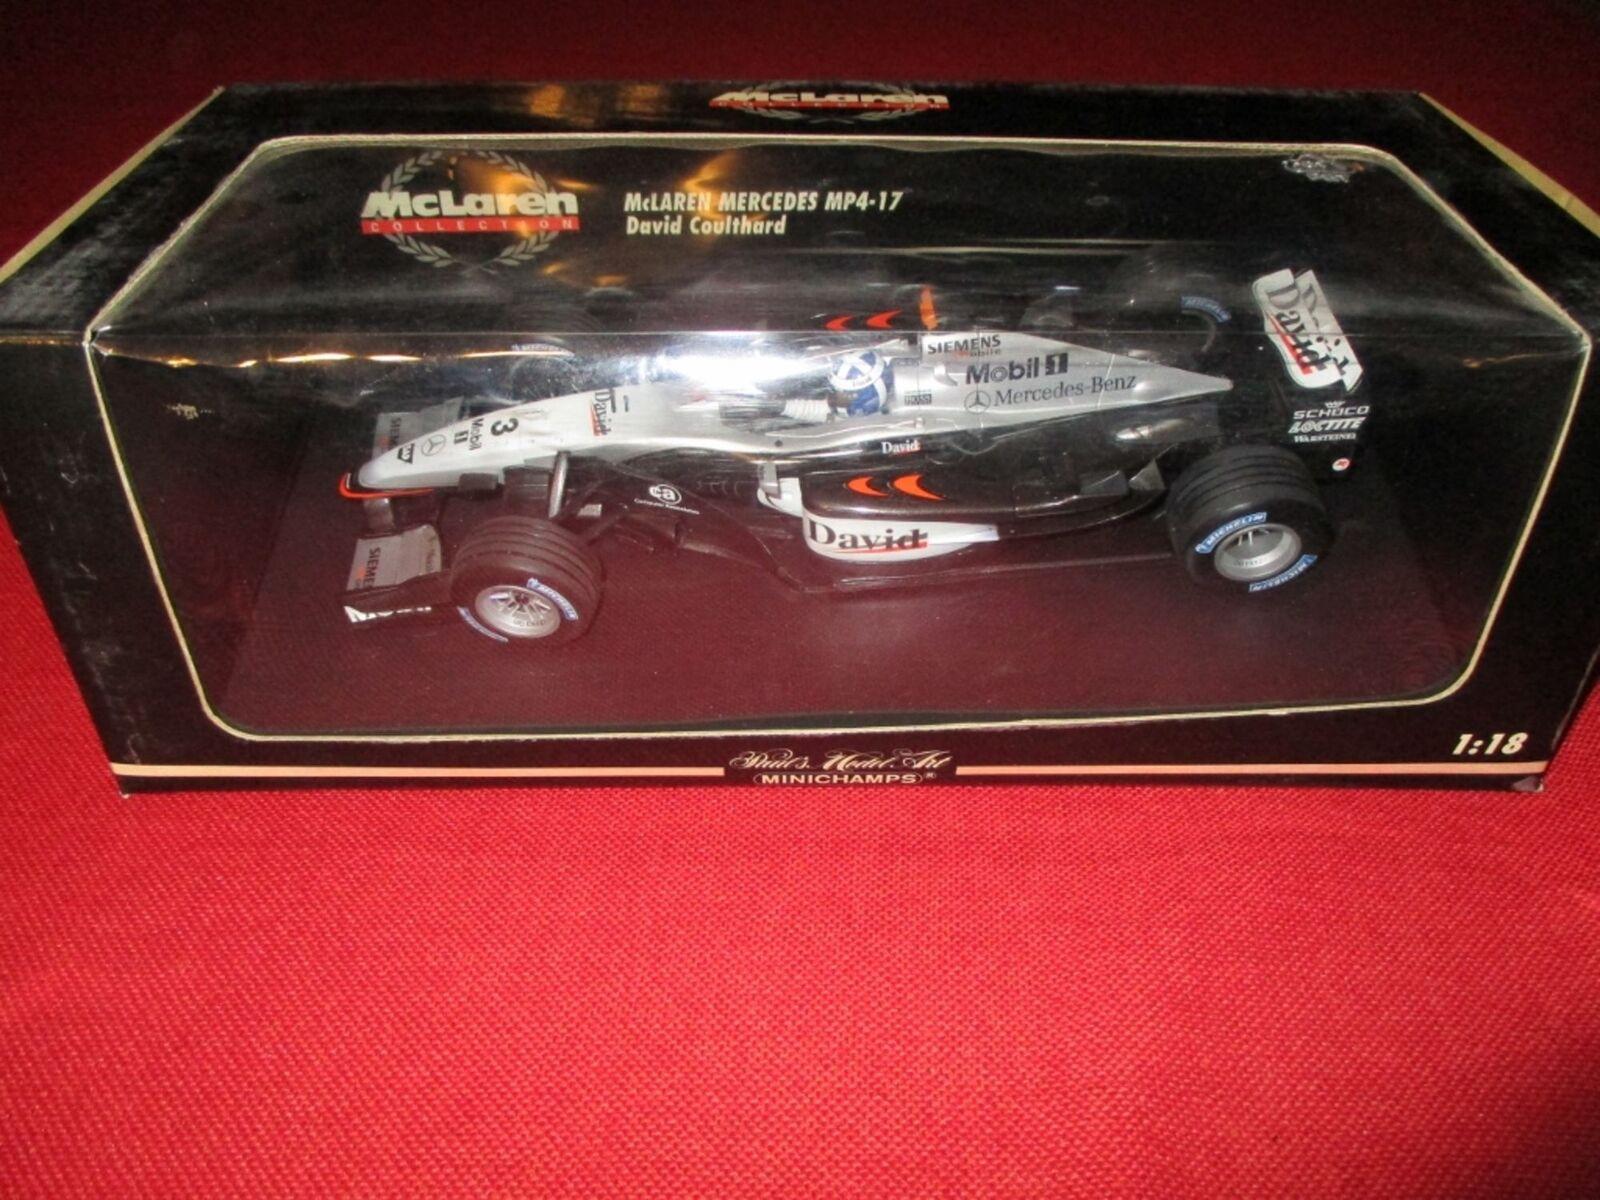 MINICHAMPS ® 530 021803 1 18 McLaren Mercedes mp4-17 David Coulthard neuf neuf dans sa boîte